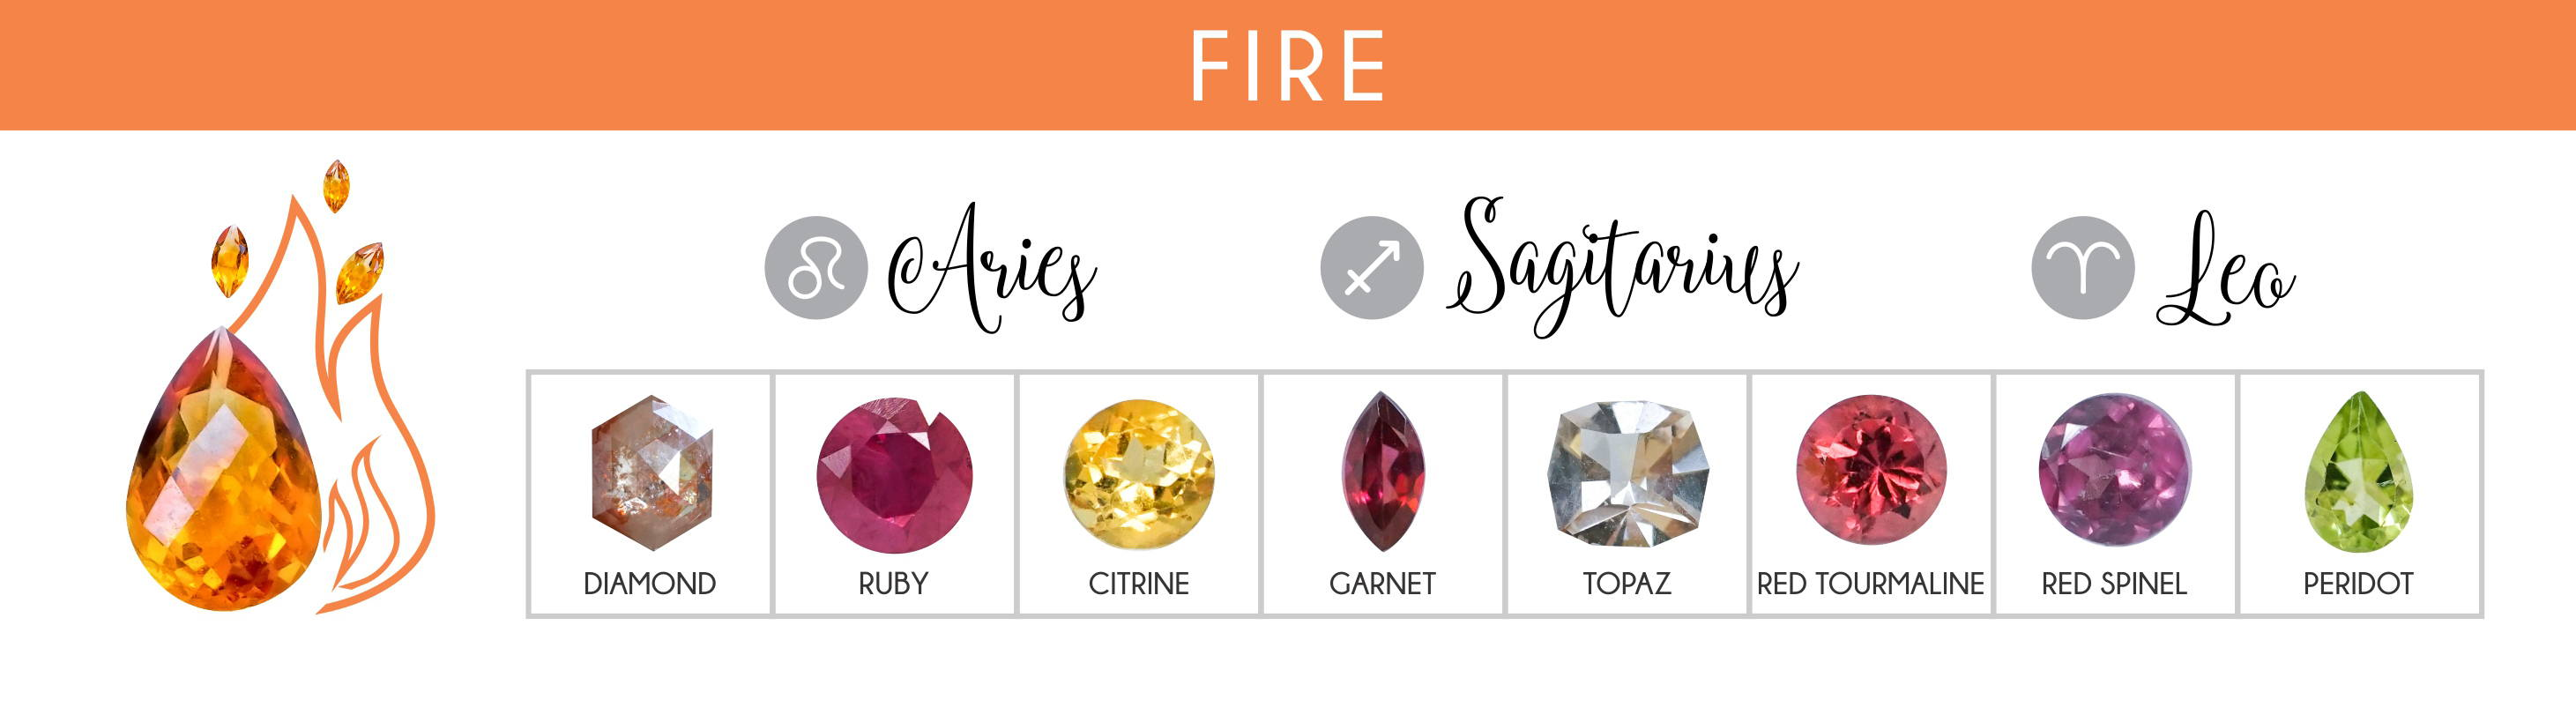 Fire element zodiacs: Aries, Sagitarius, and Leo